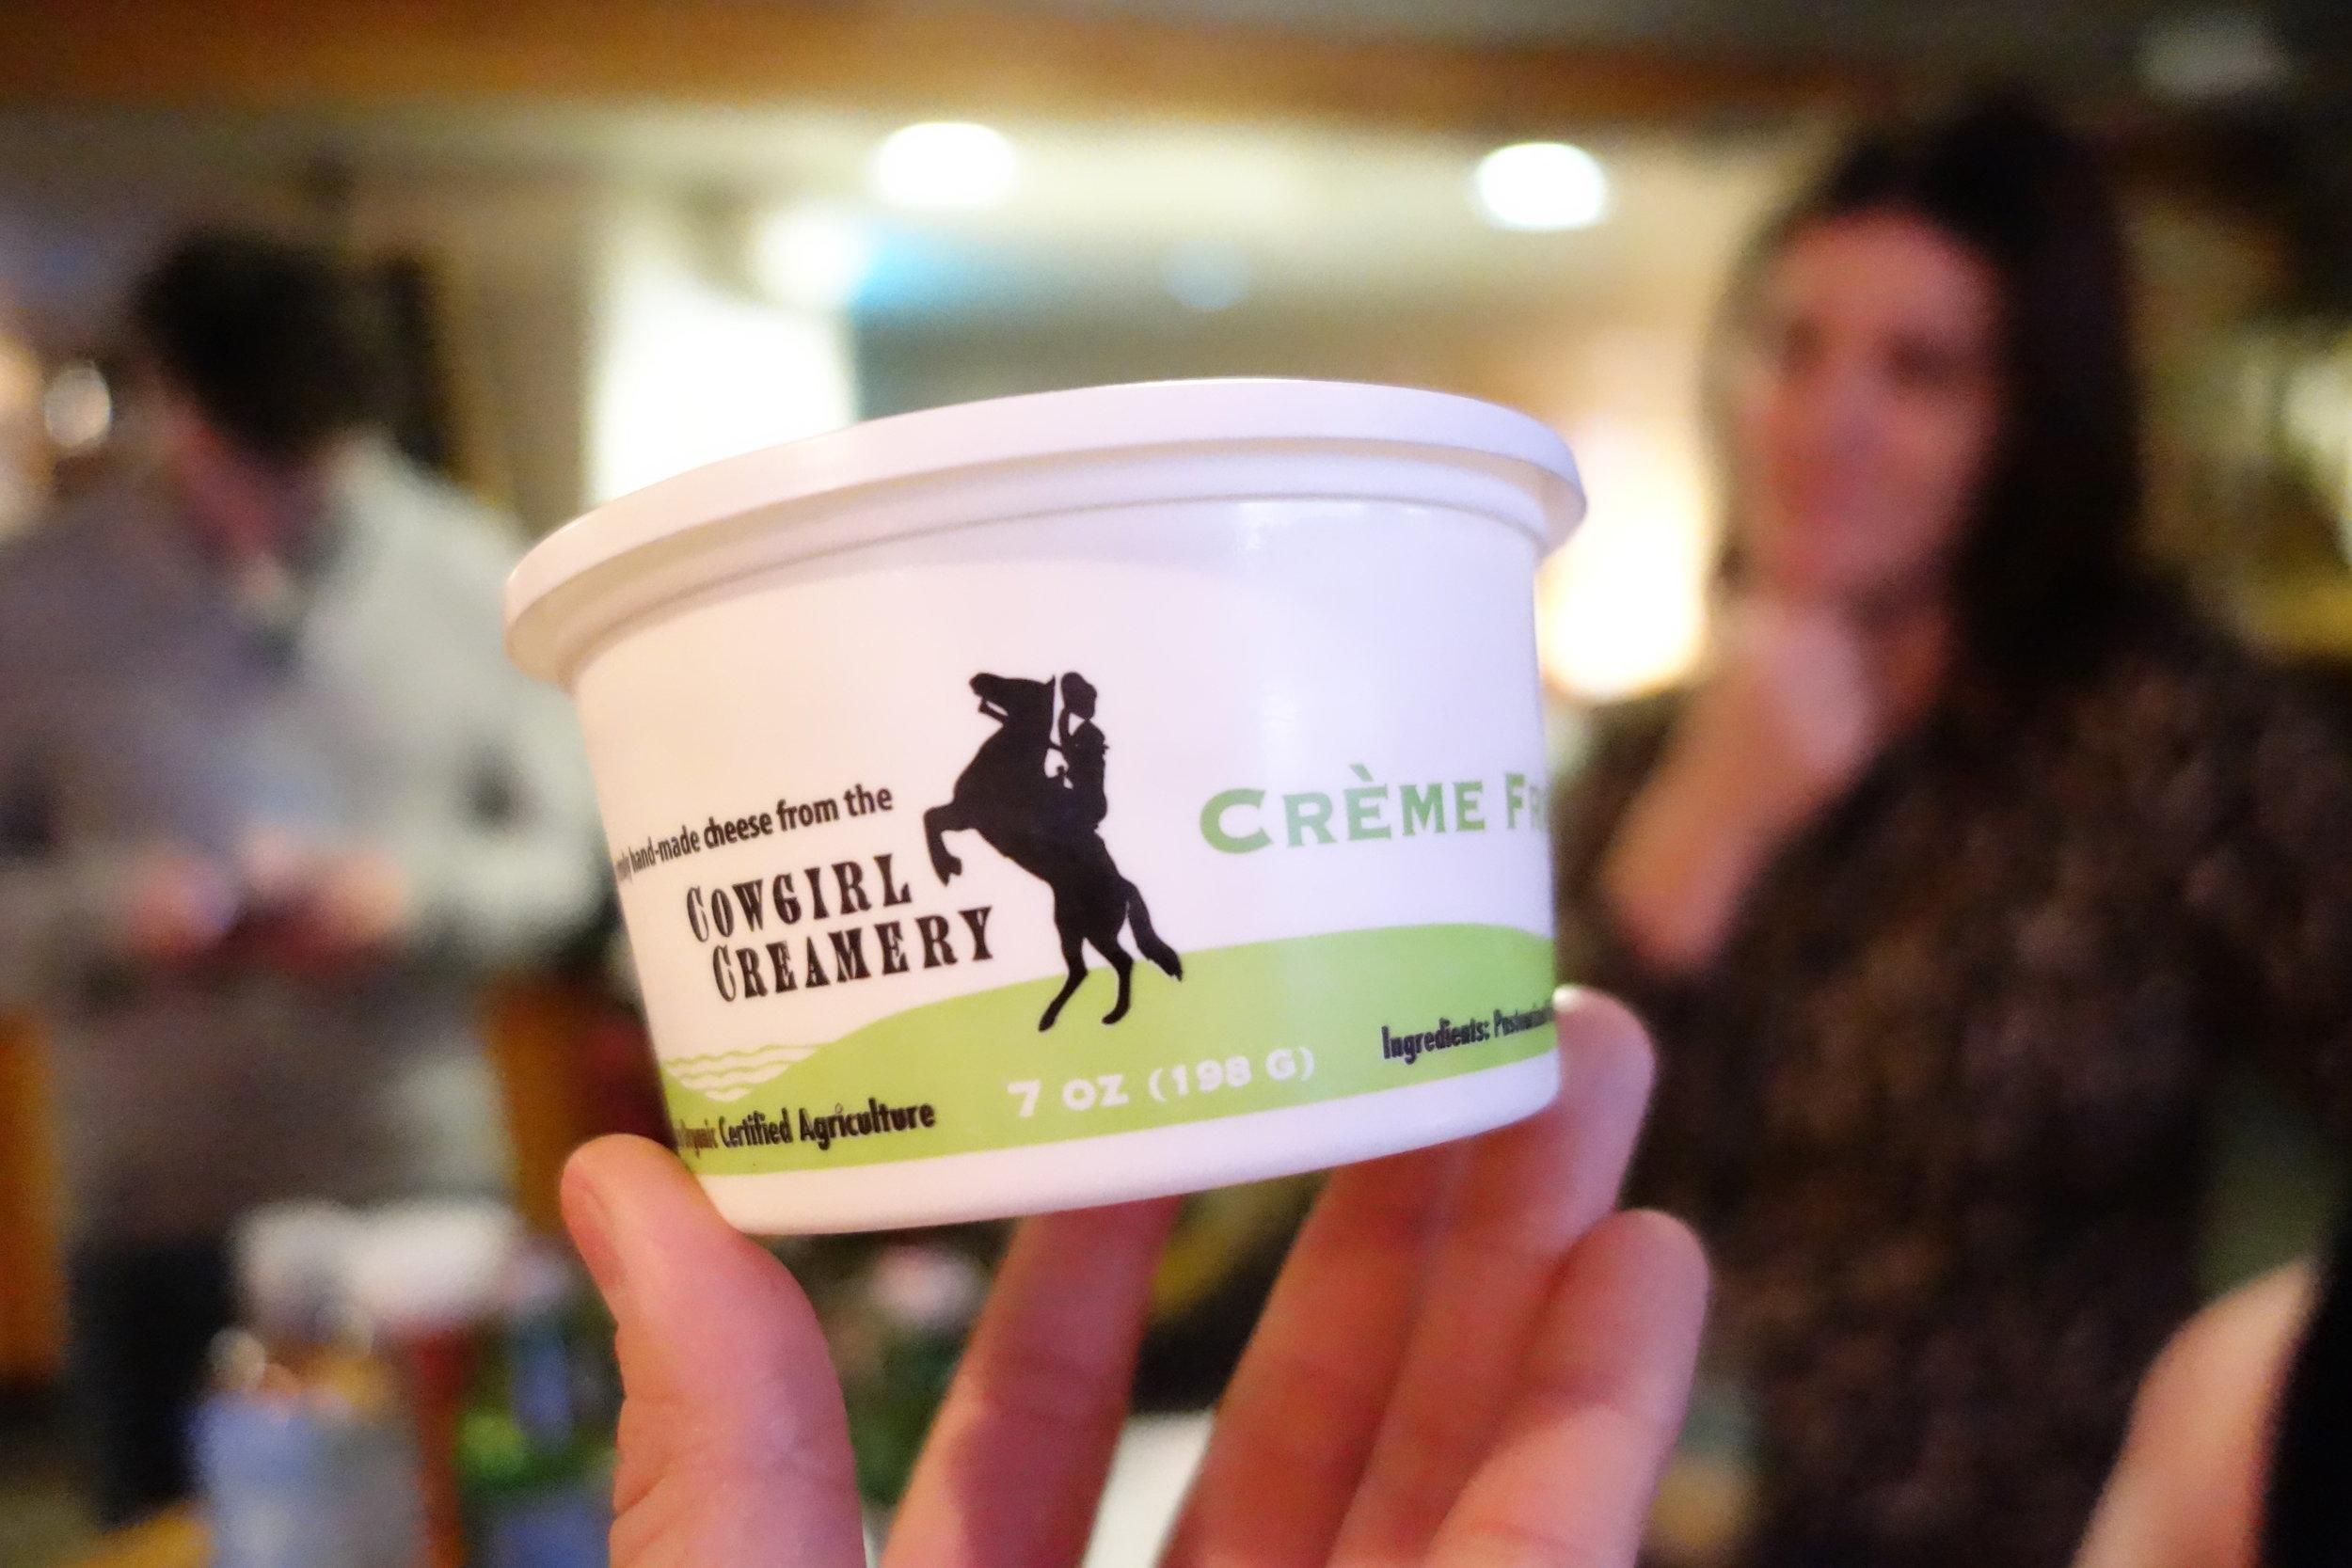 Cowgirl Creamery Crème Fraîche